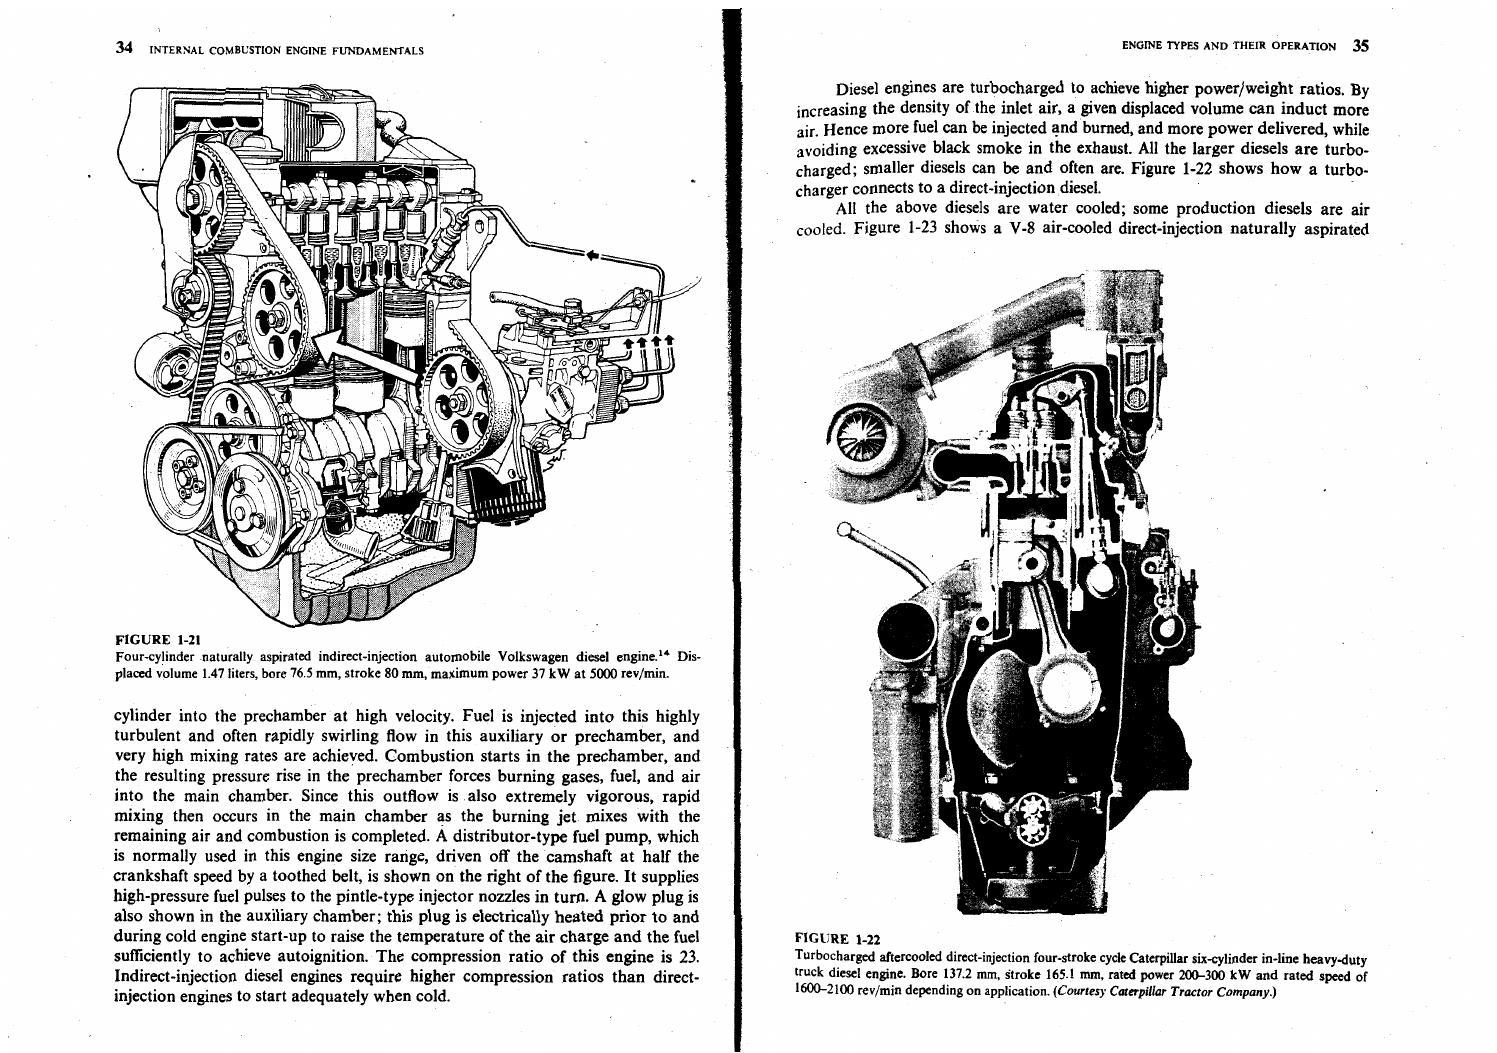 Internal Combustion Engines Fundamentals Heywood By Thai Issuu Volkswagen Diesel Engine Diagram